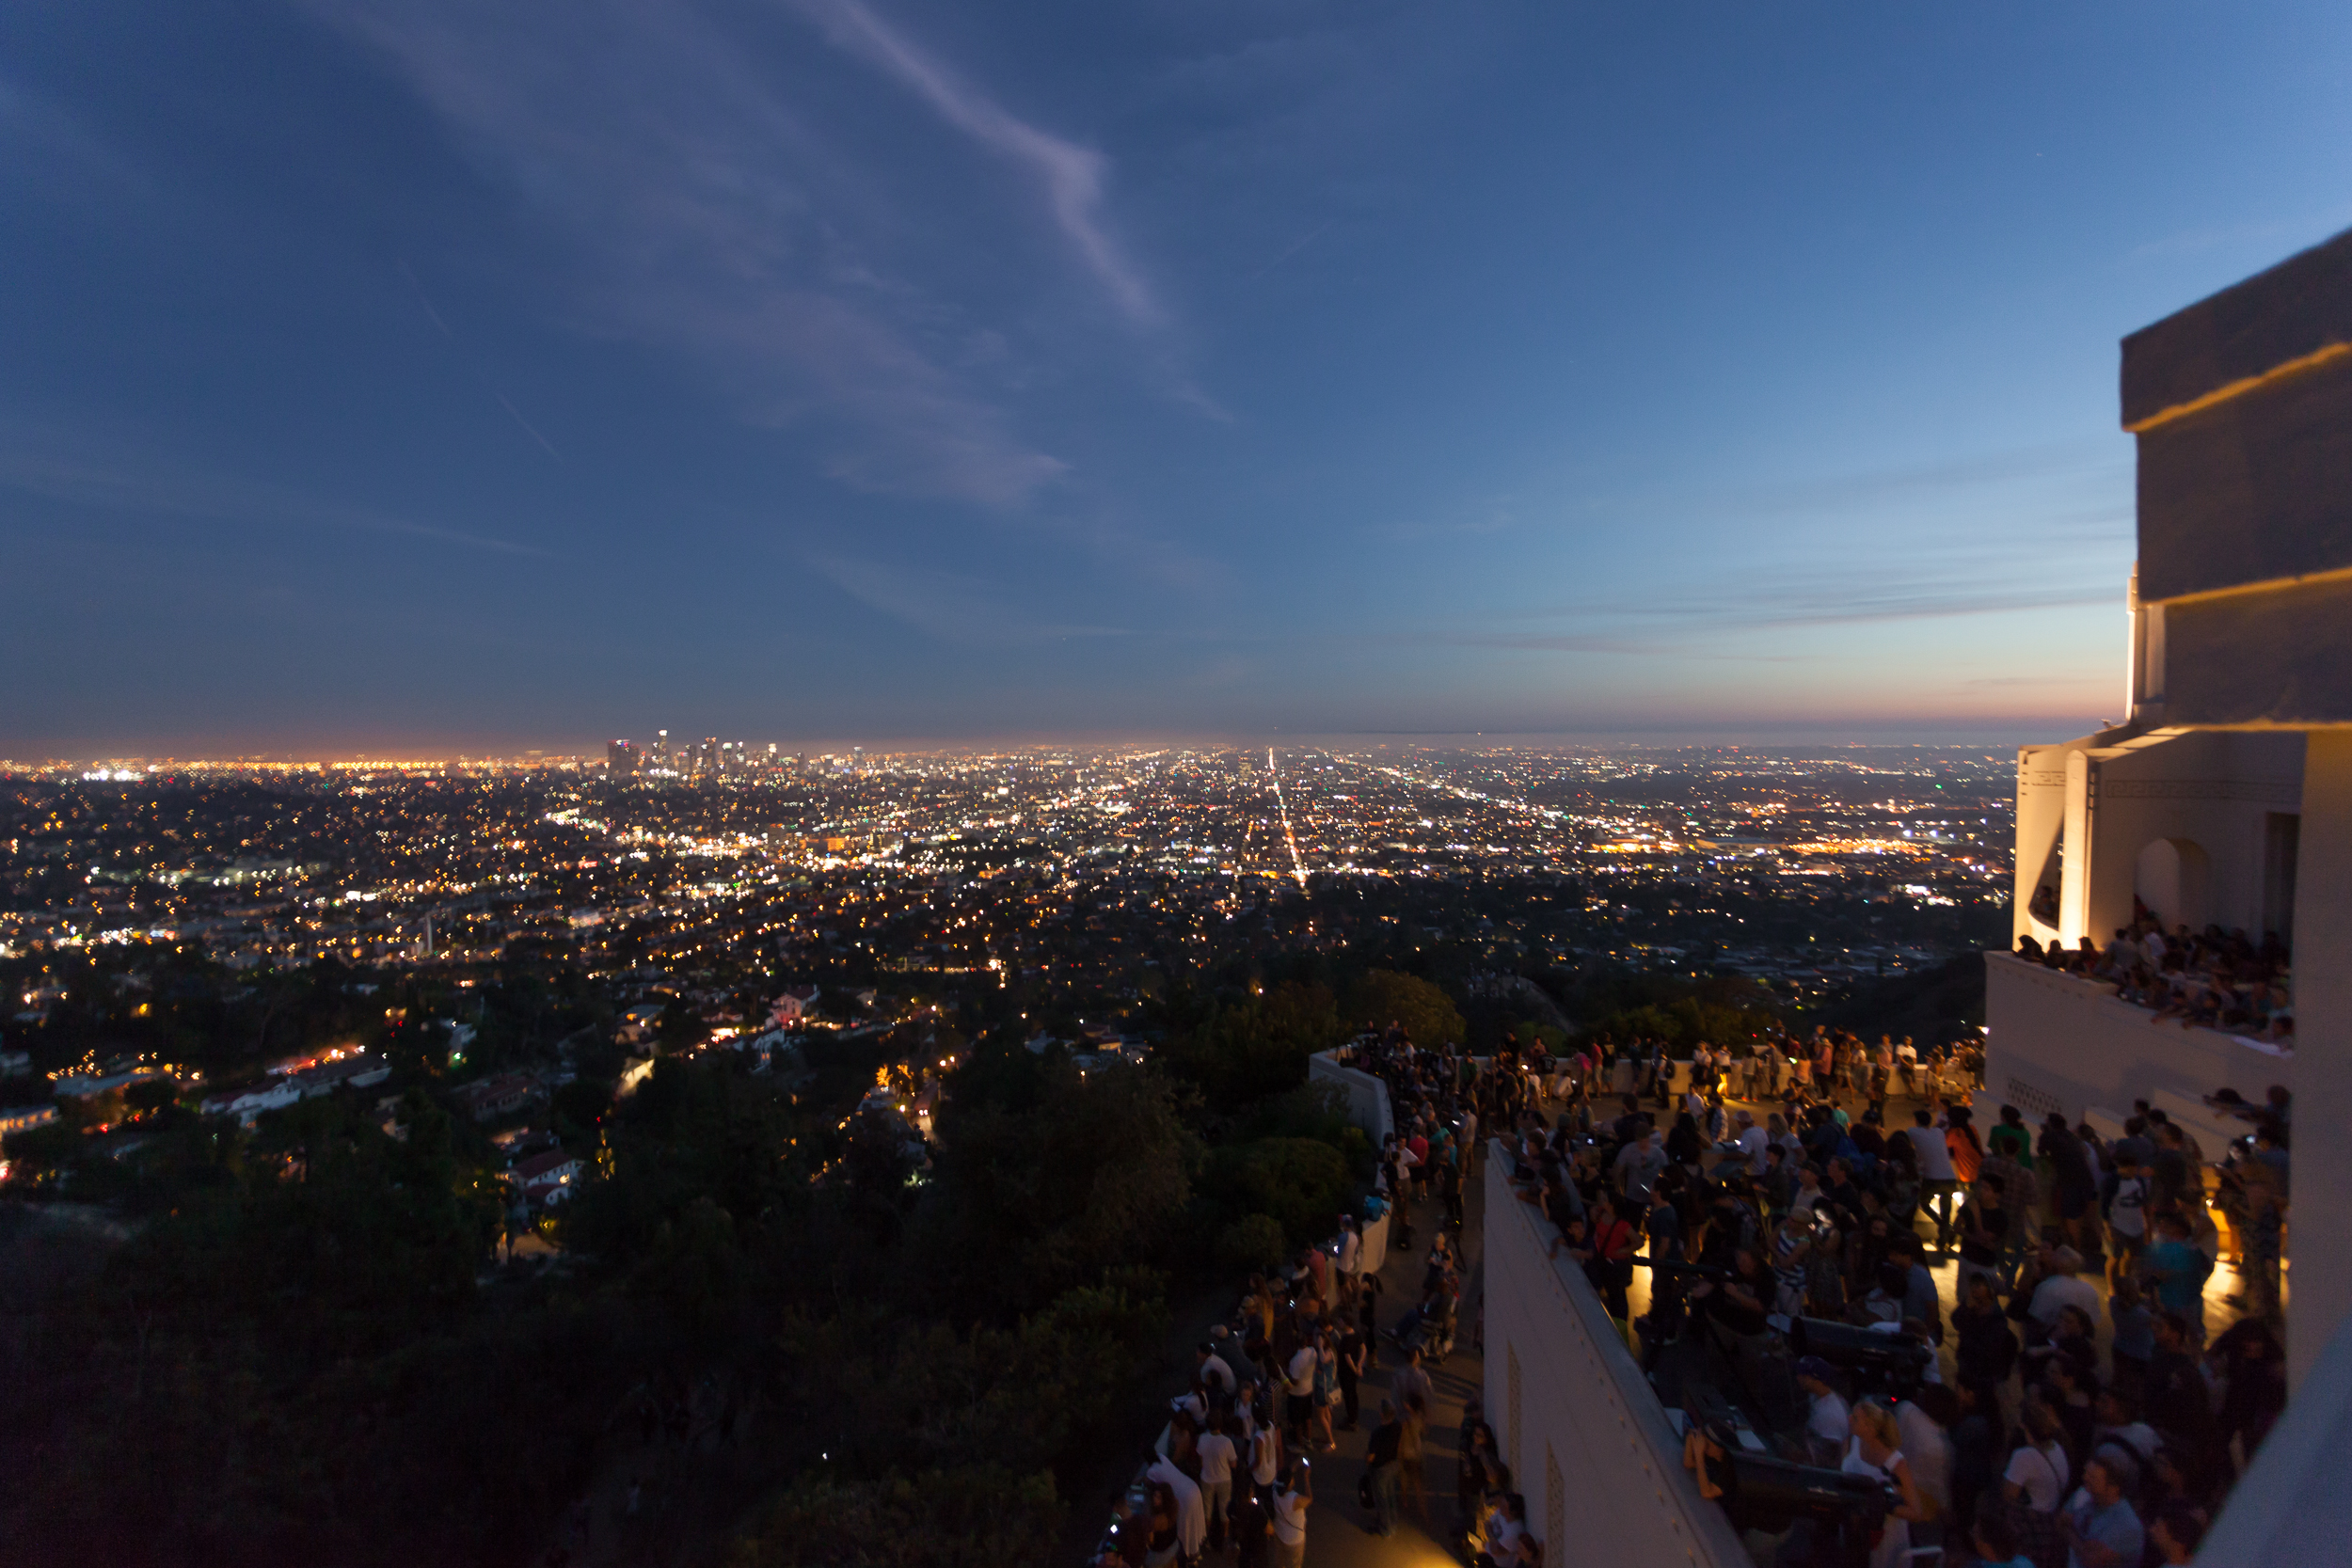 Chacon Images_LA_Travel_WEB_-0809.jpg